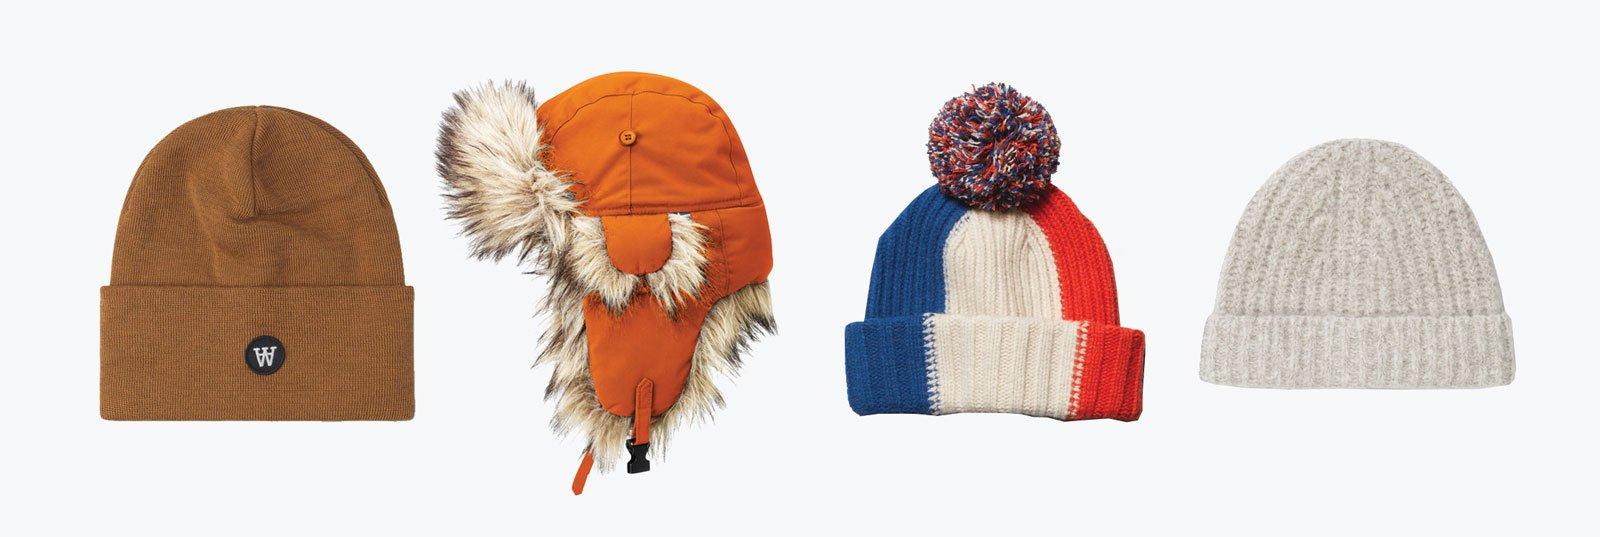 scandinavian hats autumn winter essentials